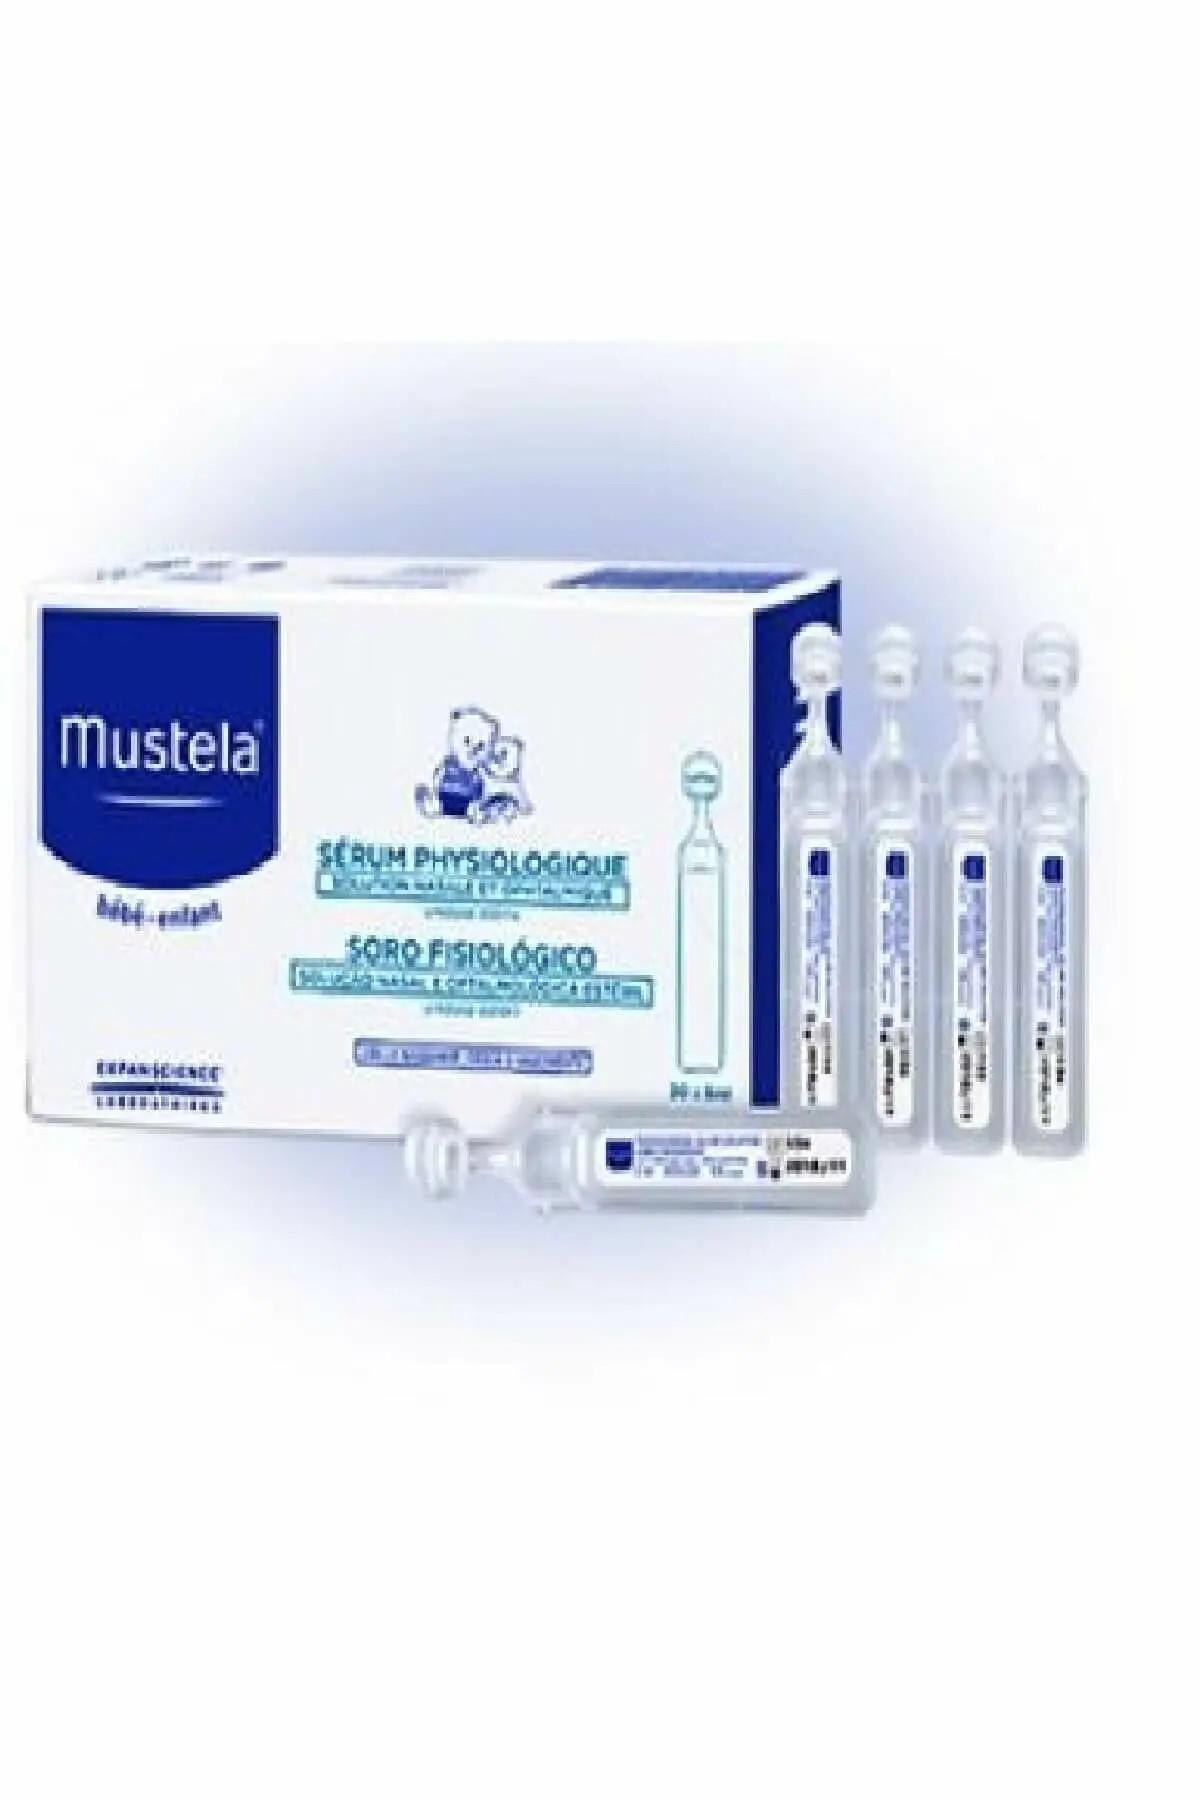 Mustela Physiological Saline 5 Ml 20'li Flakon Serum Fizyolojik . 1